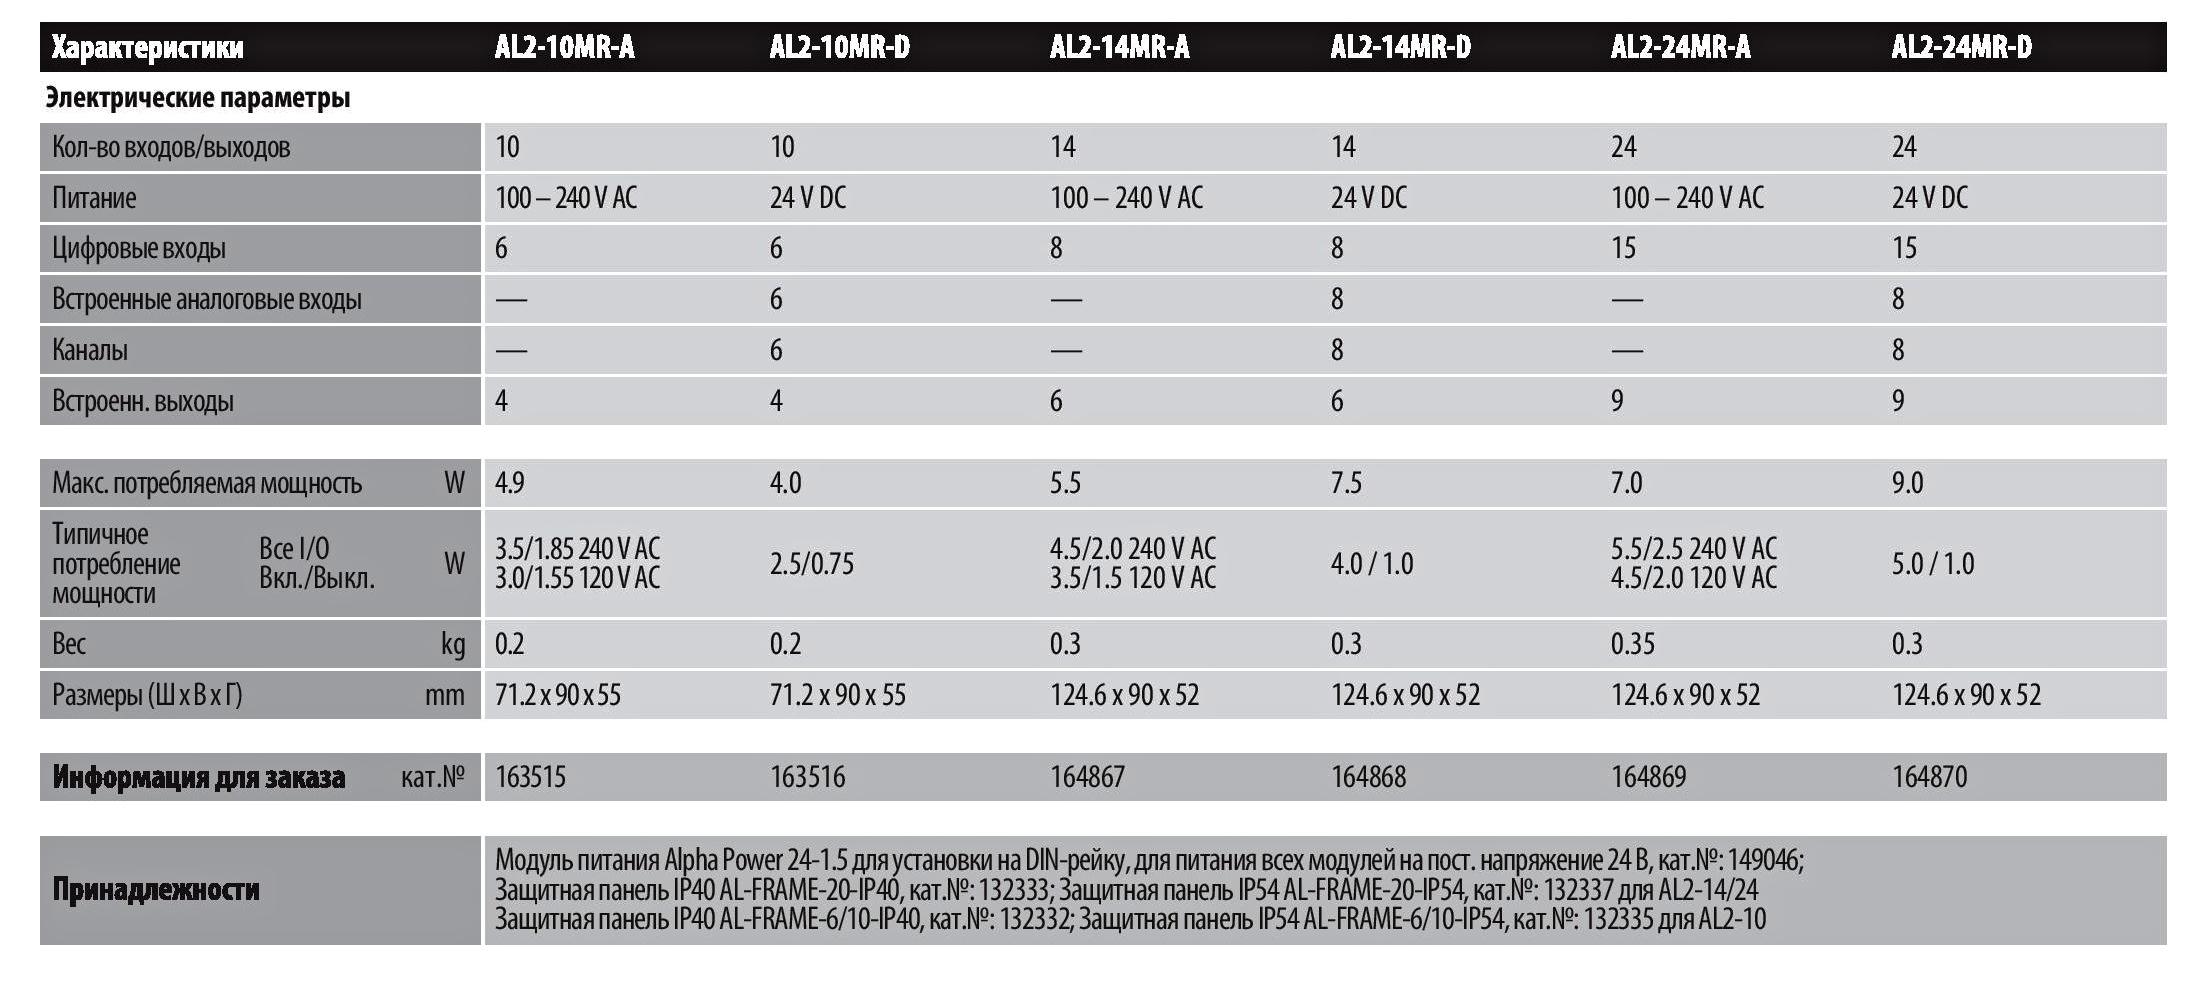 каталог Alpha XL-page-002 (1)